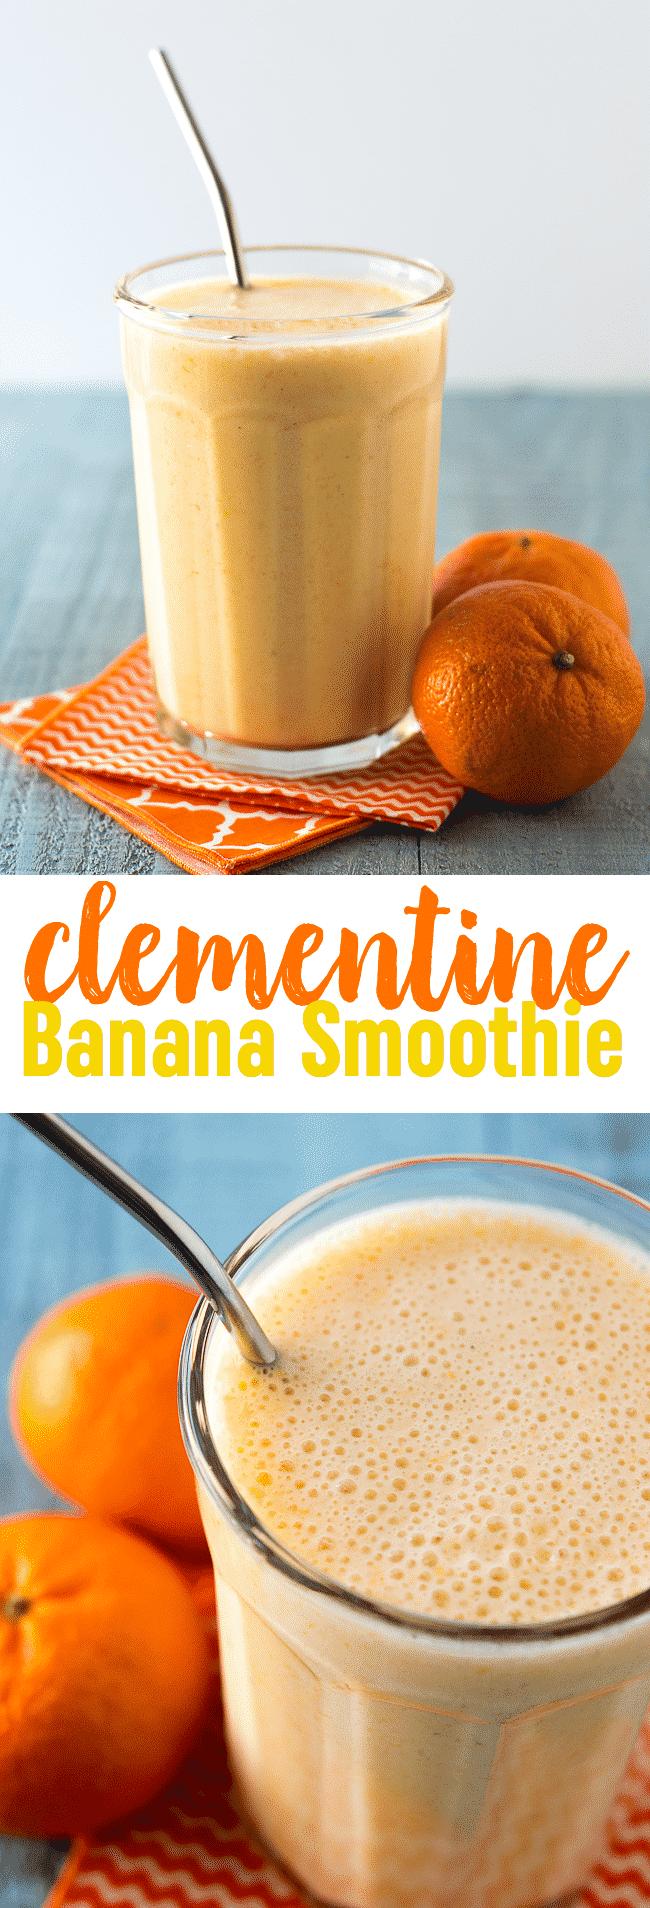 Clementine Banana Smoothie Recipe | Orange Banana Smoothie | Sunshine Smoothie Recipe | Vitamin C Smoothie | Cuties | Mandarin